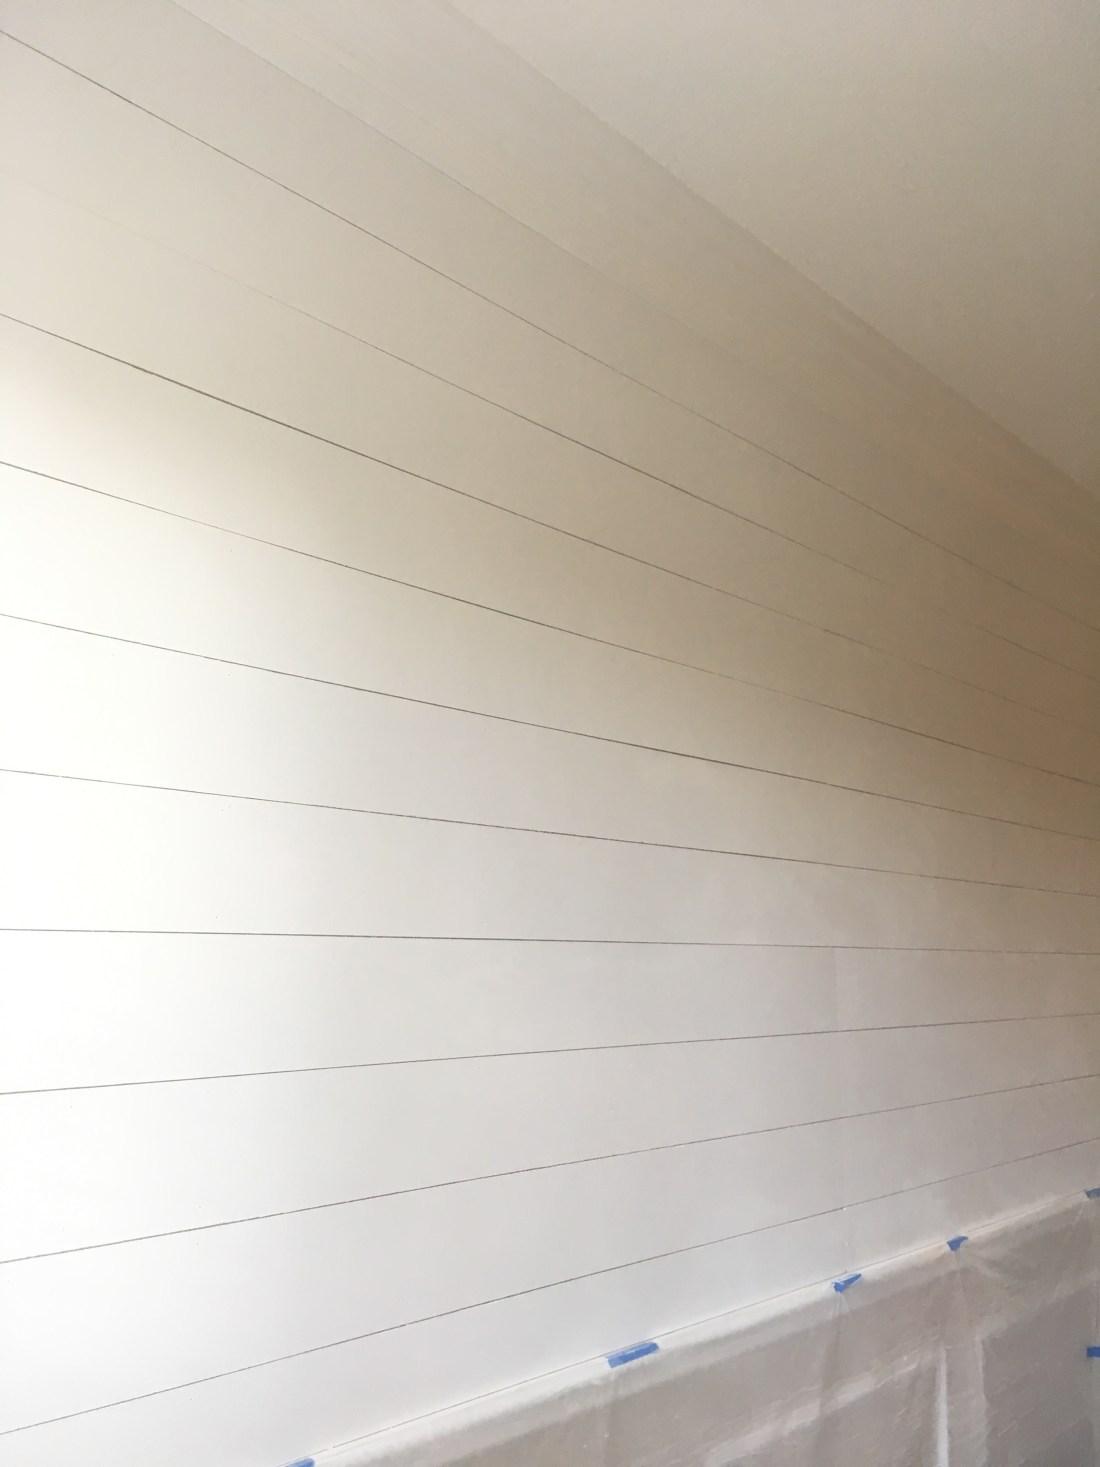 DIY Shiplap Wall - #Shiplap #DIY #Projects #HomeProjects